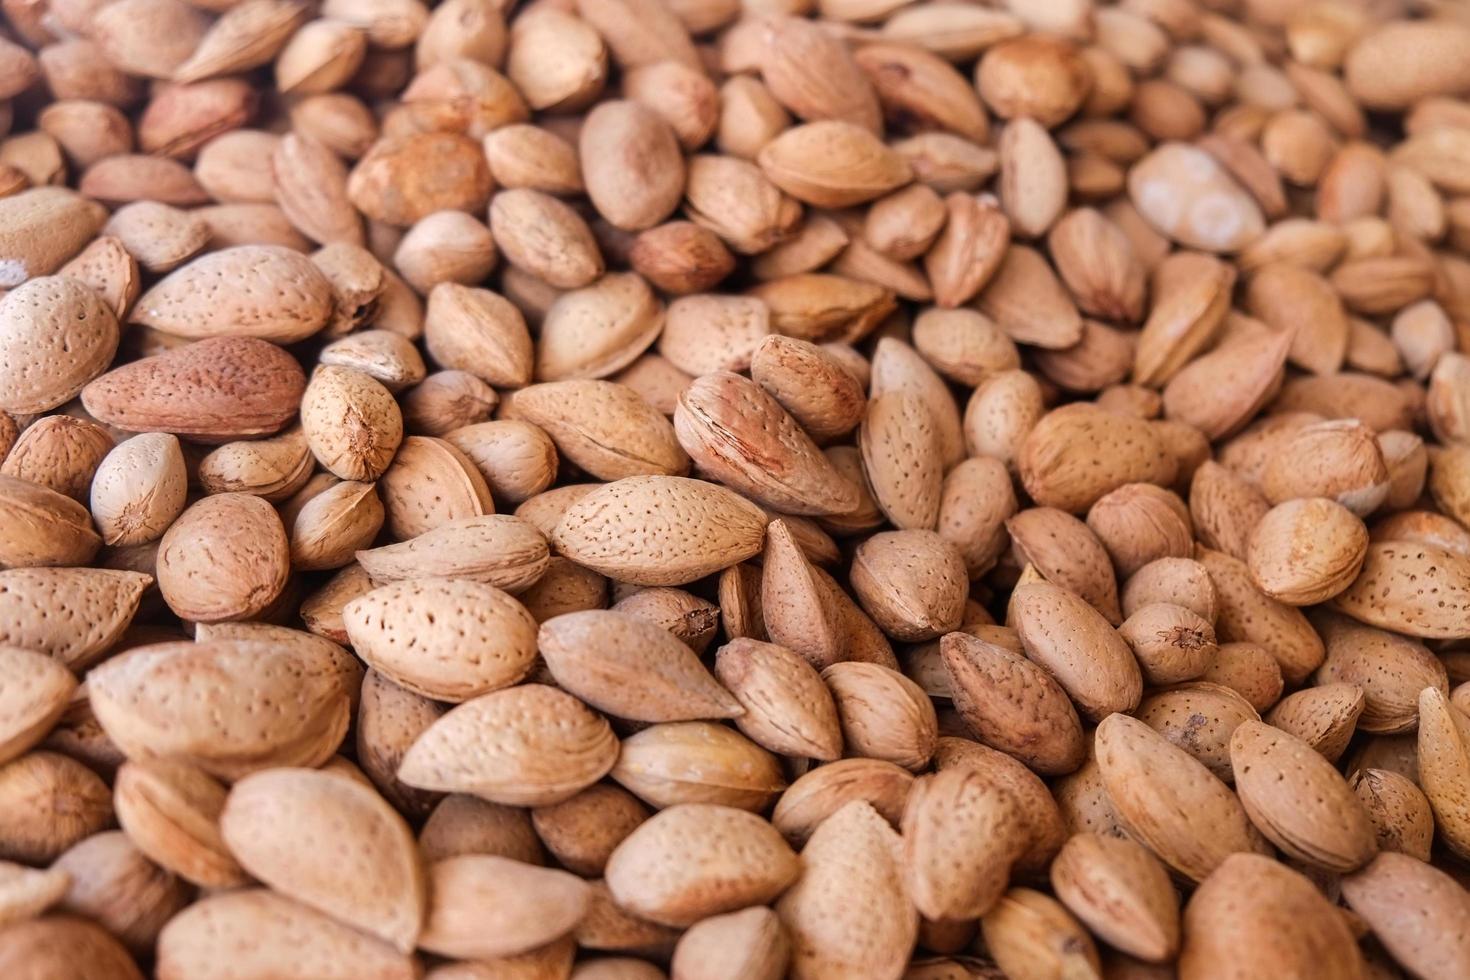 Heap of whole almonds  photo